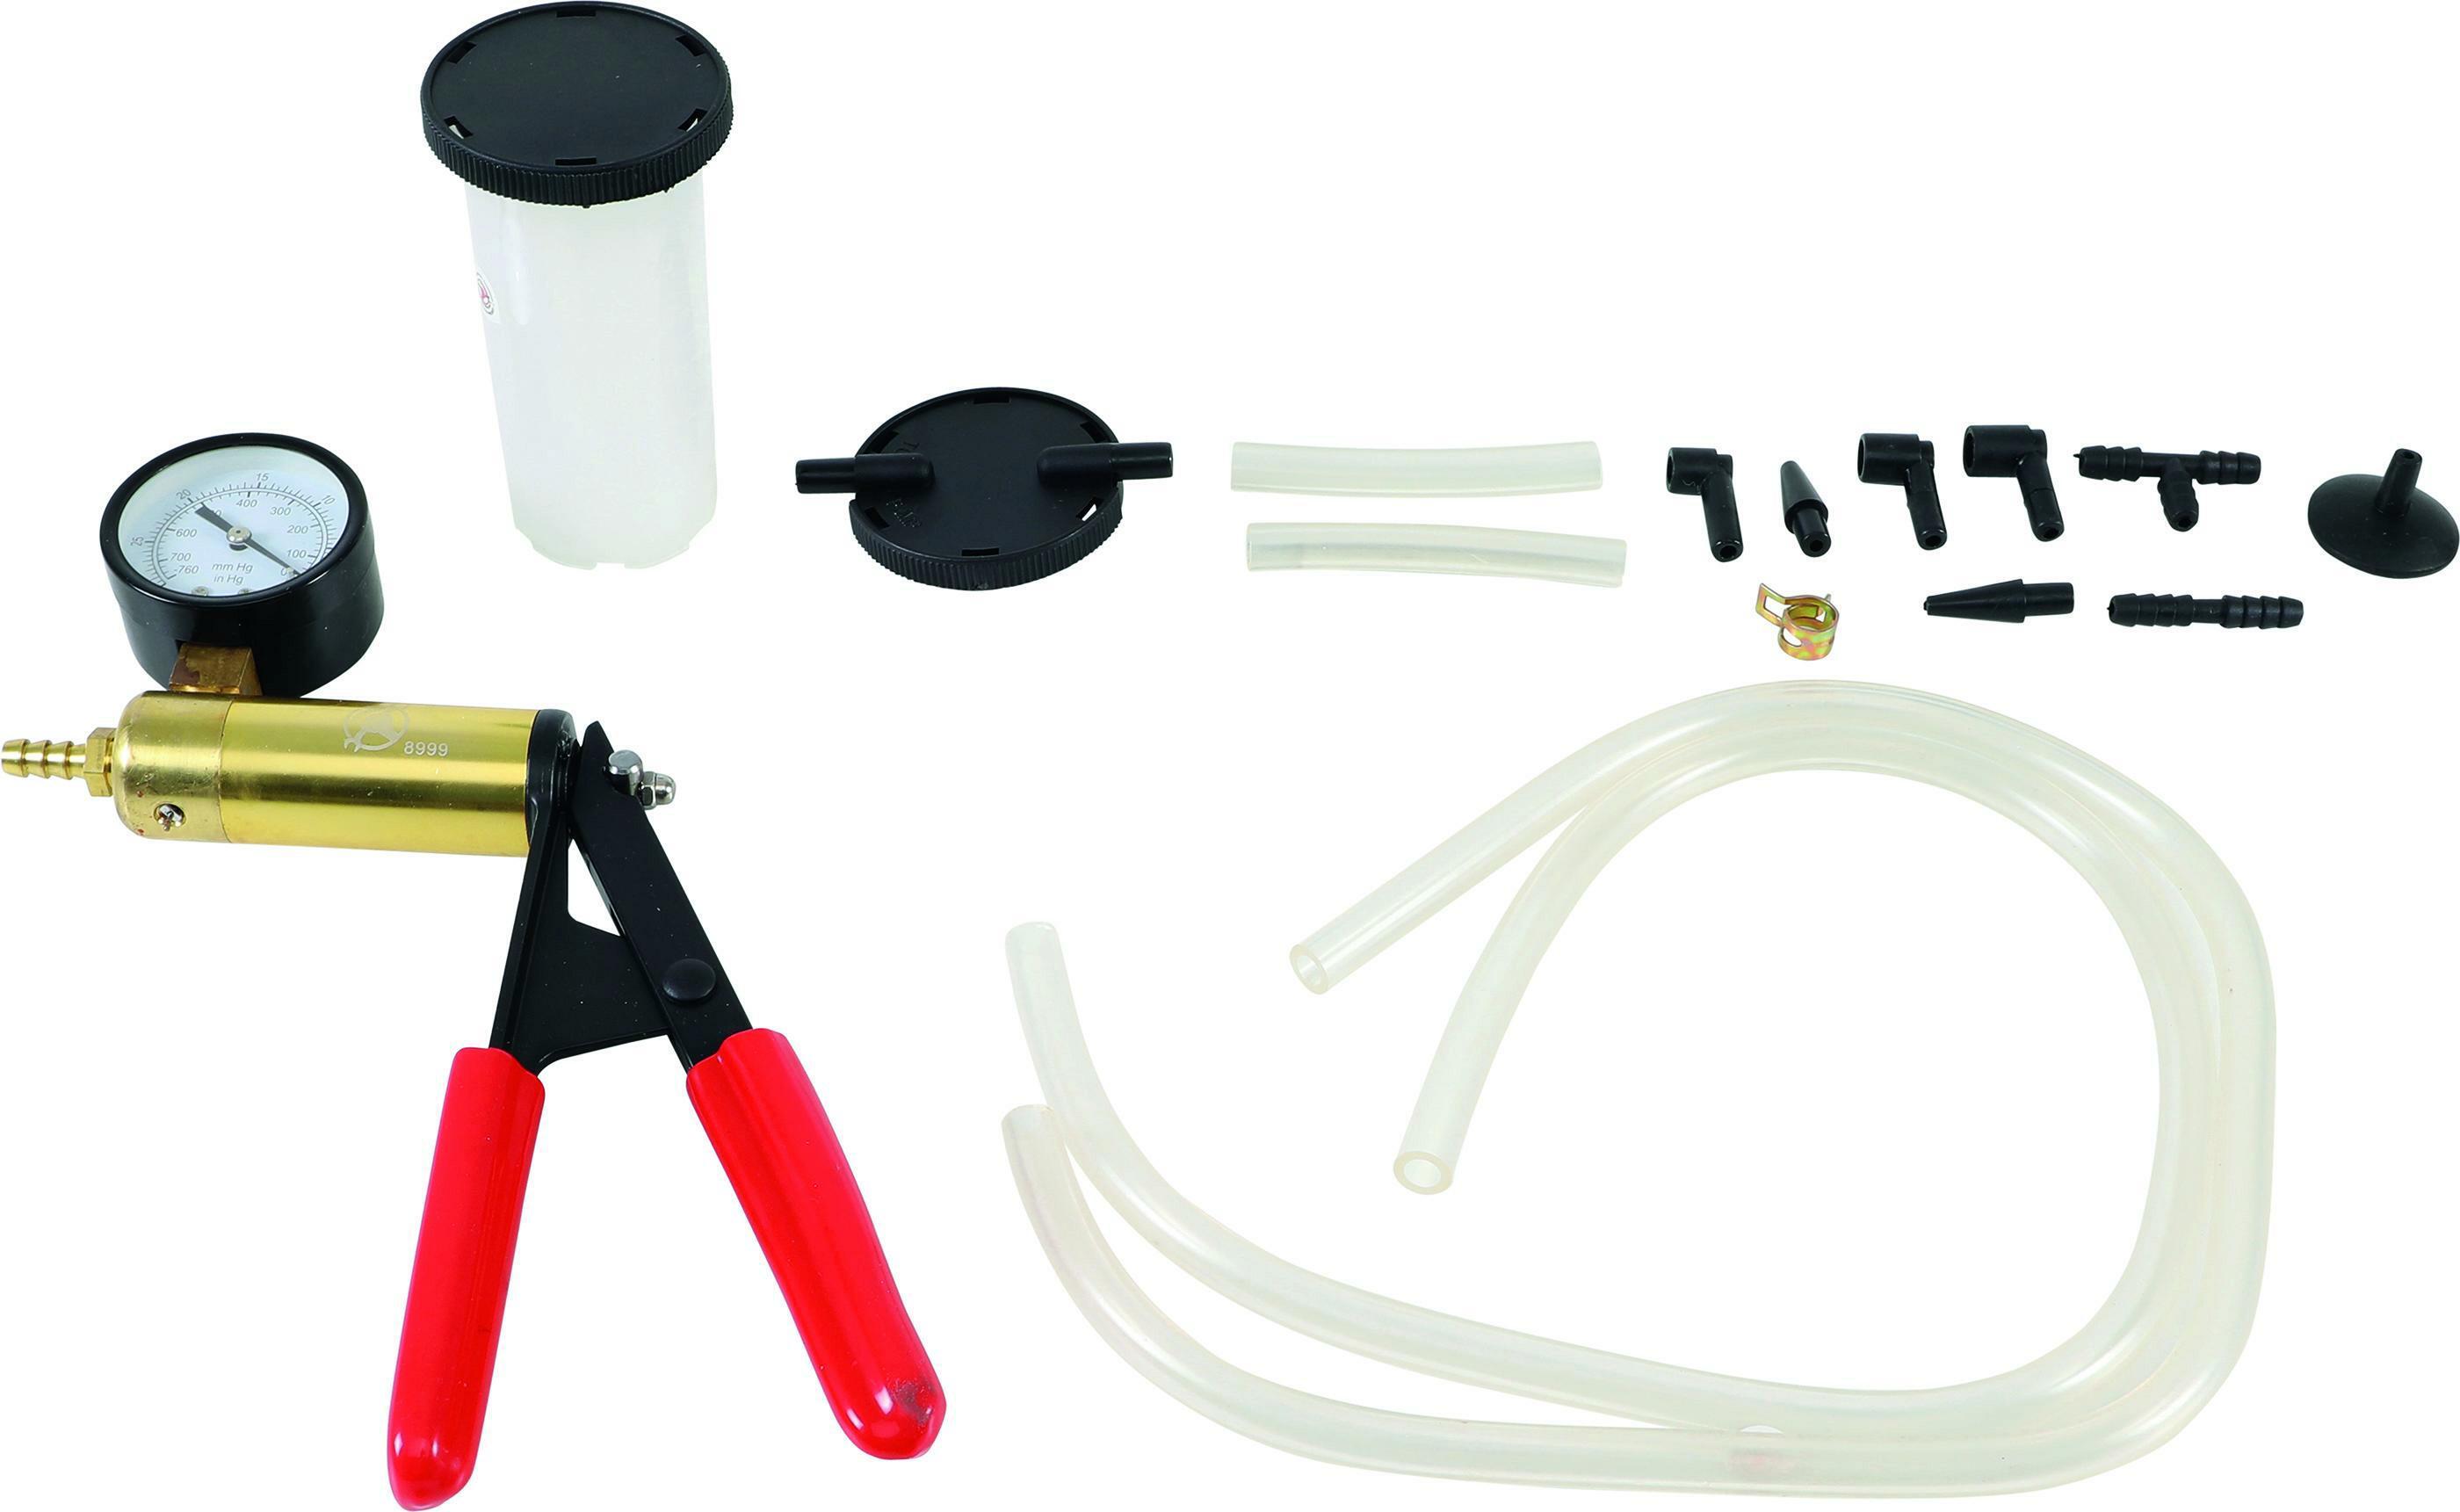 Vakuumpumpe/Bremsenentlüfter | max. 0,7 bar